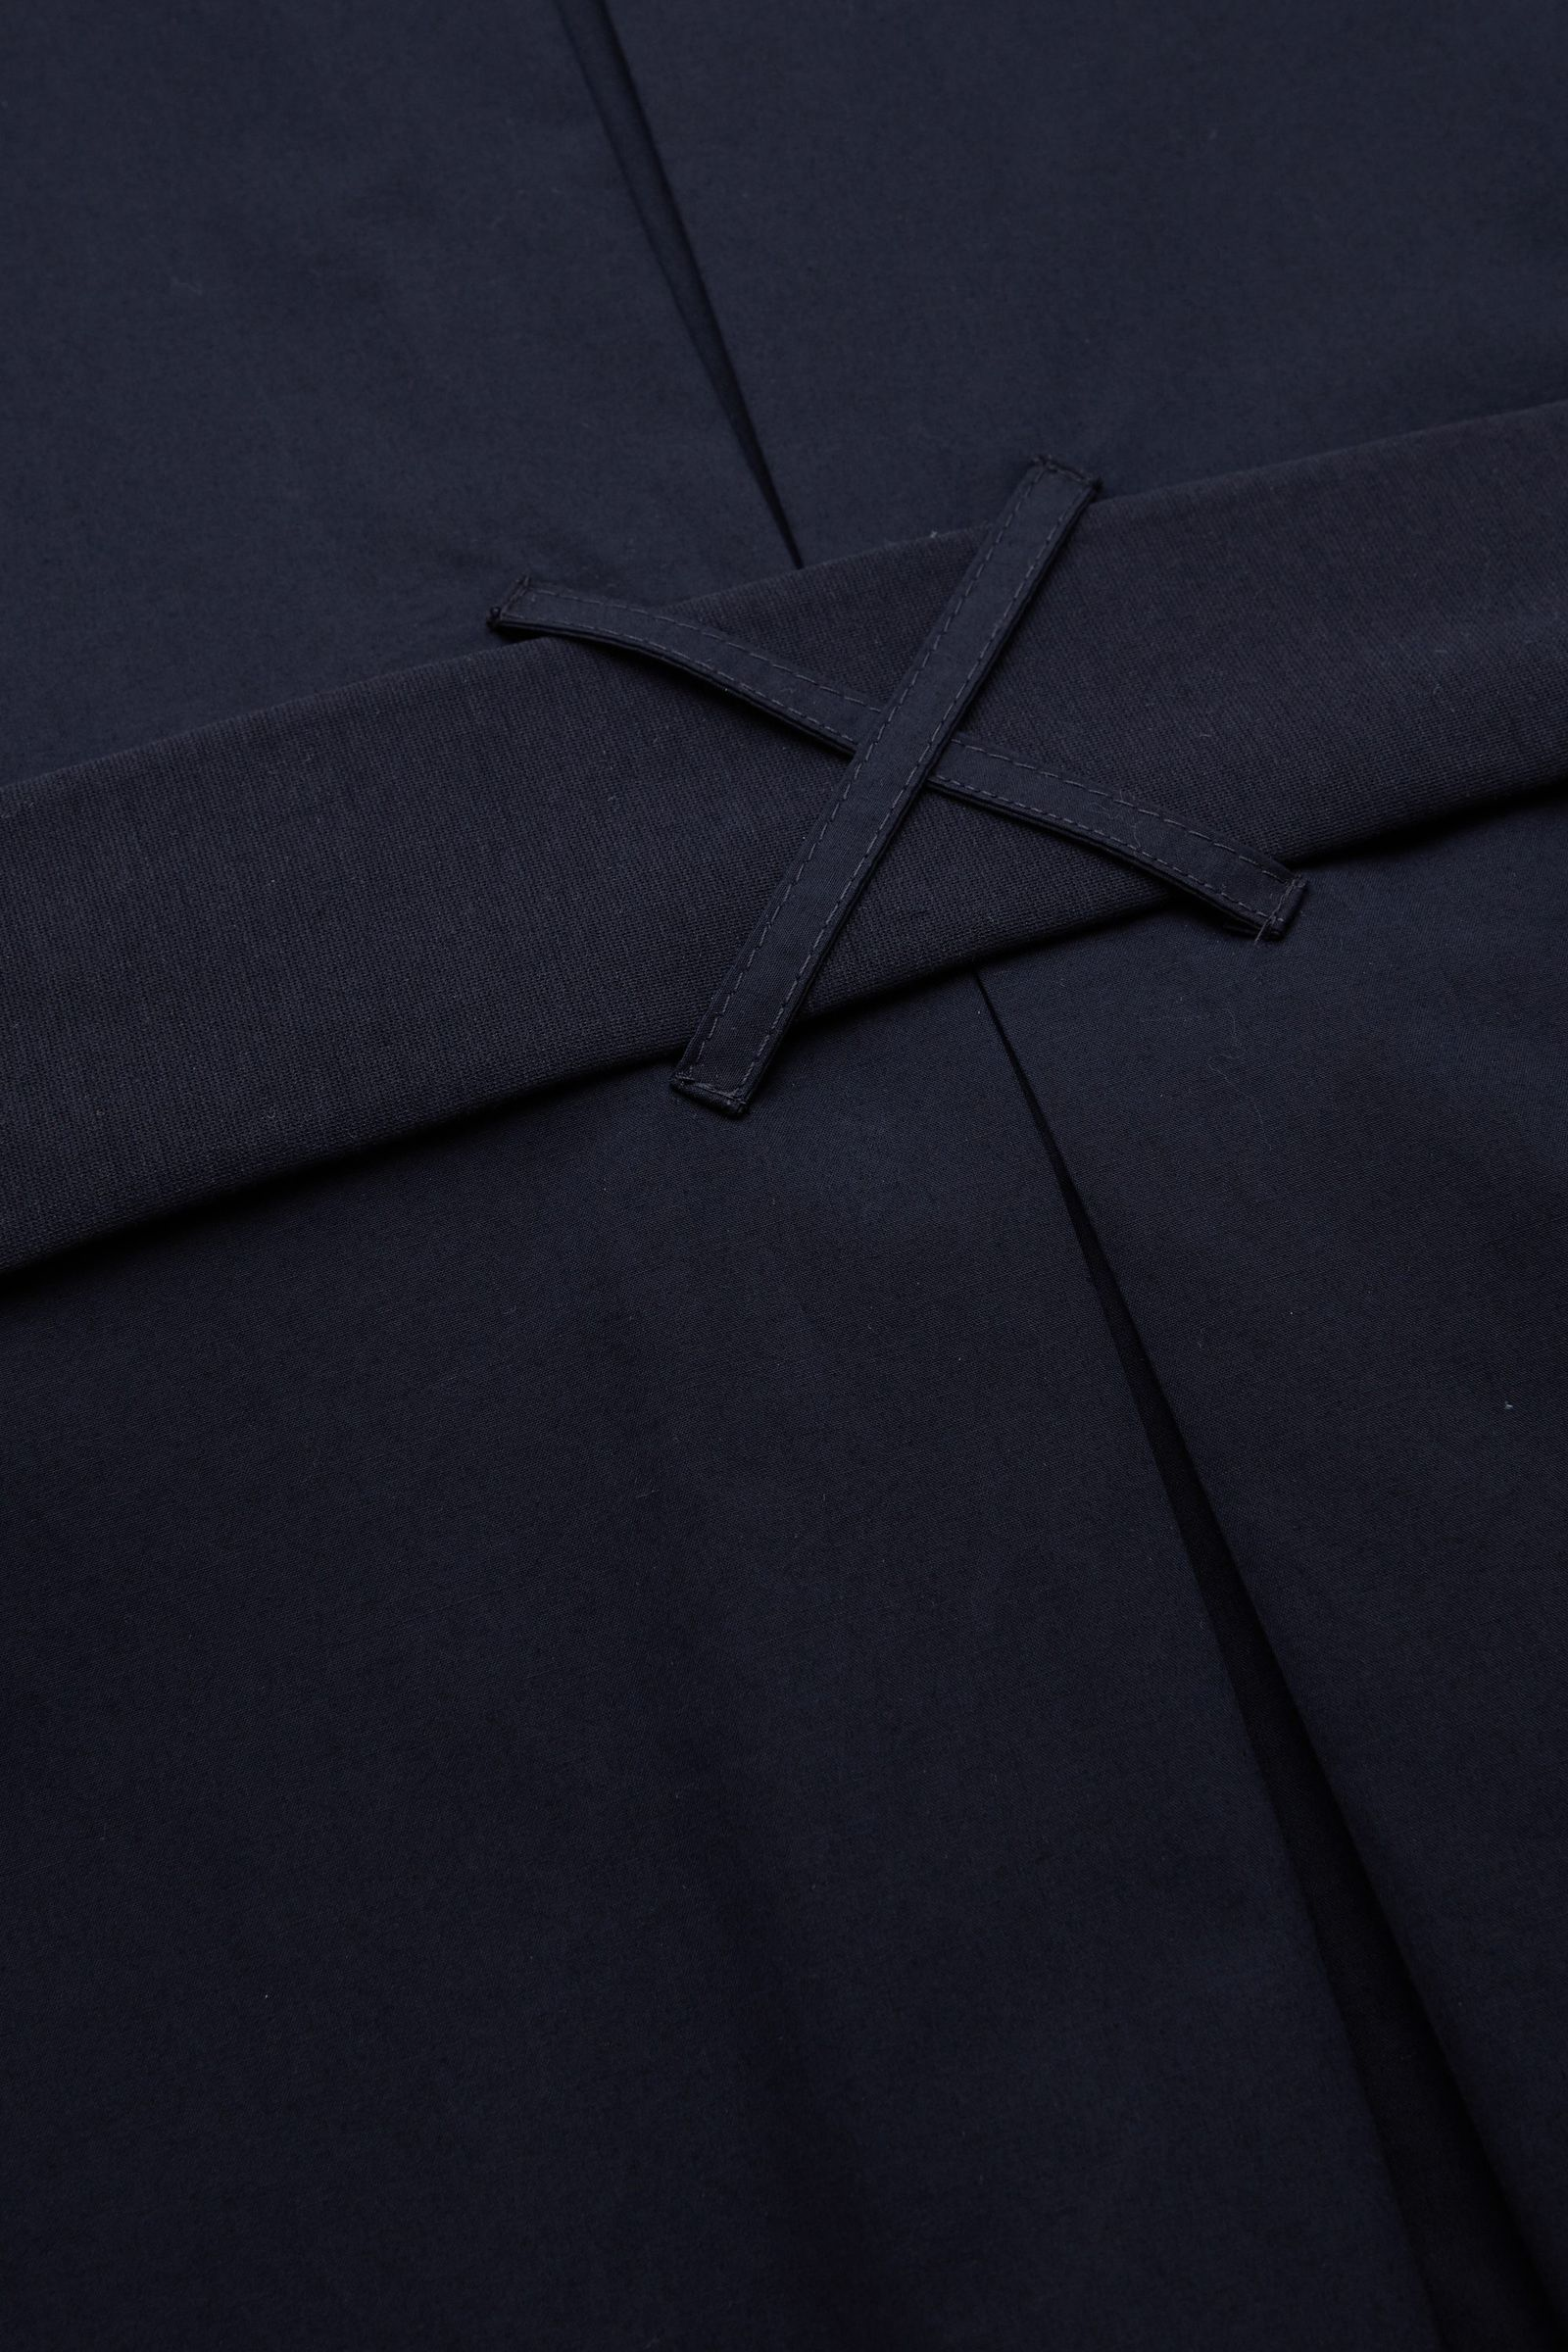 COS 코튼 저지 셔츠 드레스의 네이비컬러 Detail입니다.